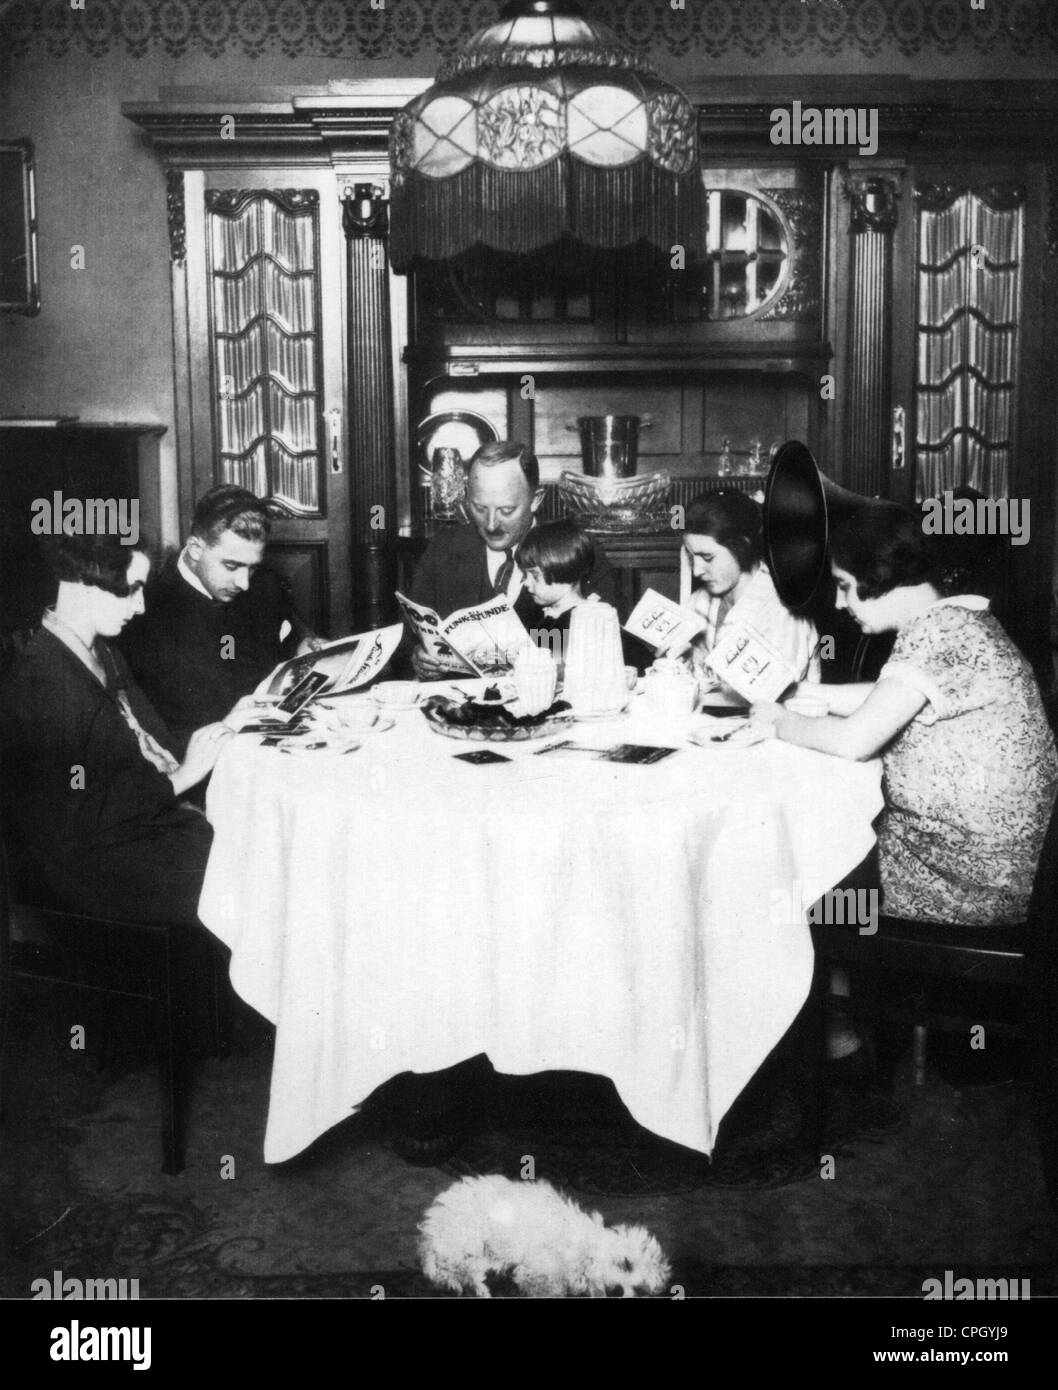 1920s family stockfotos 1920s family bilder alamy for Wohnzimmer 20er jahre